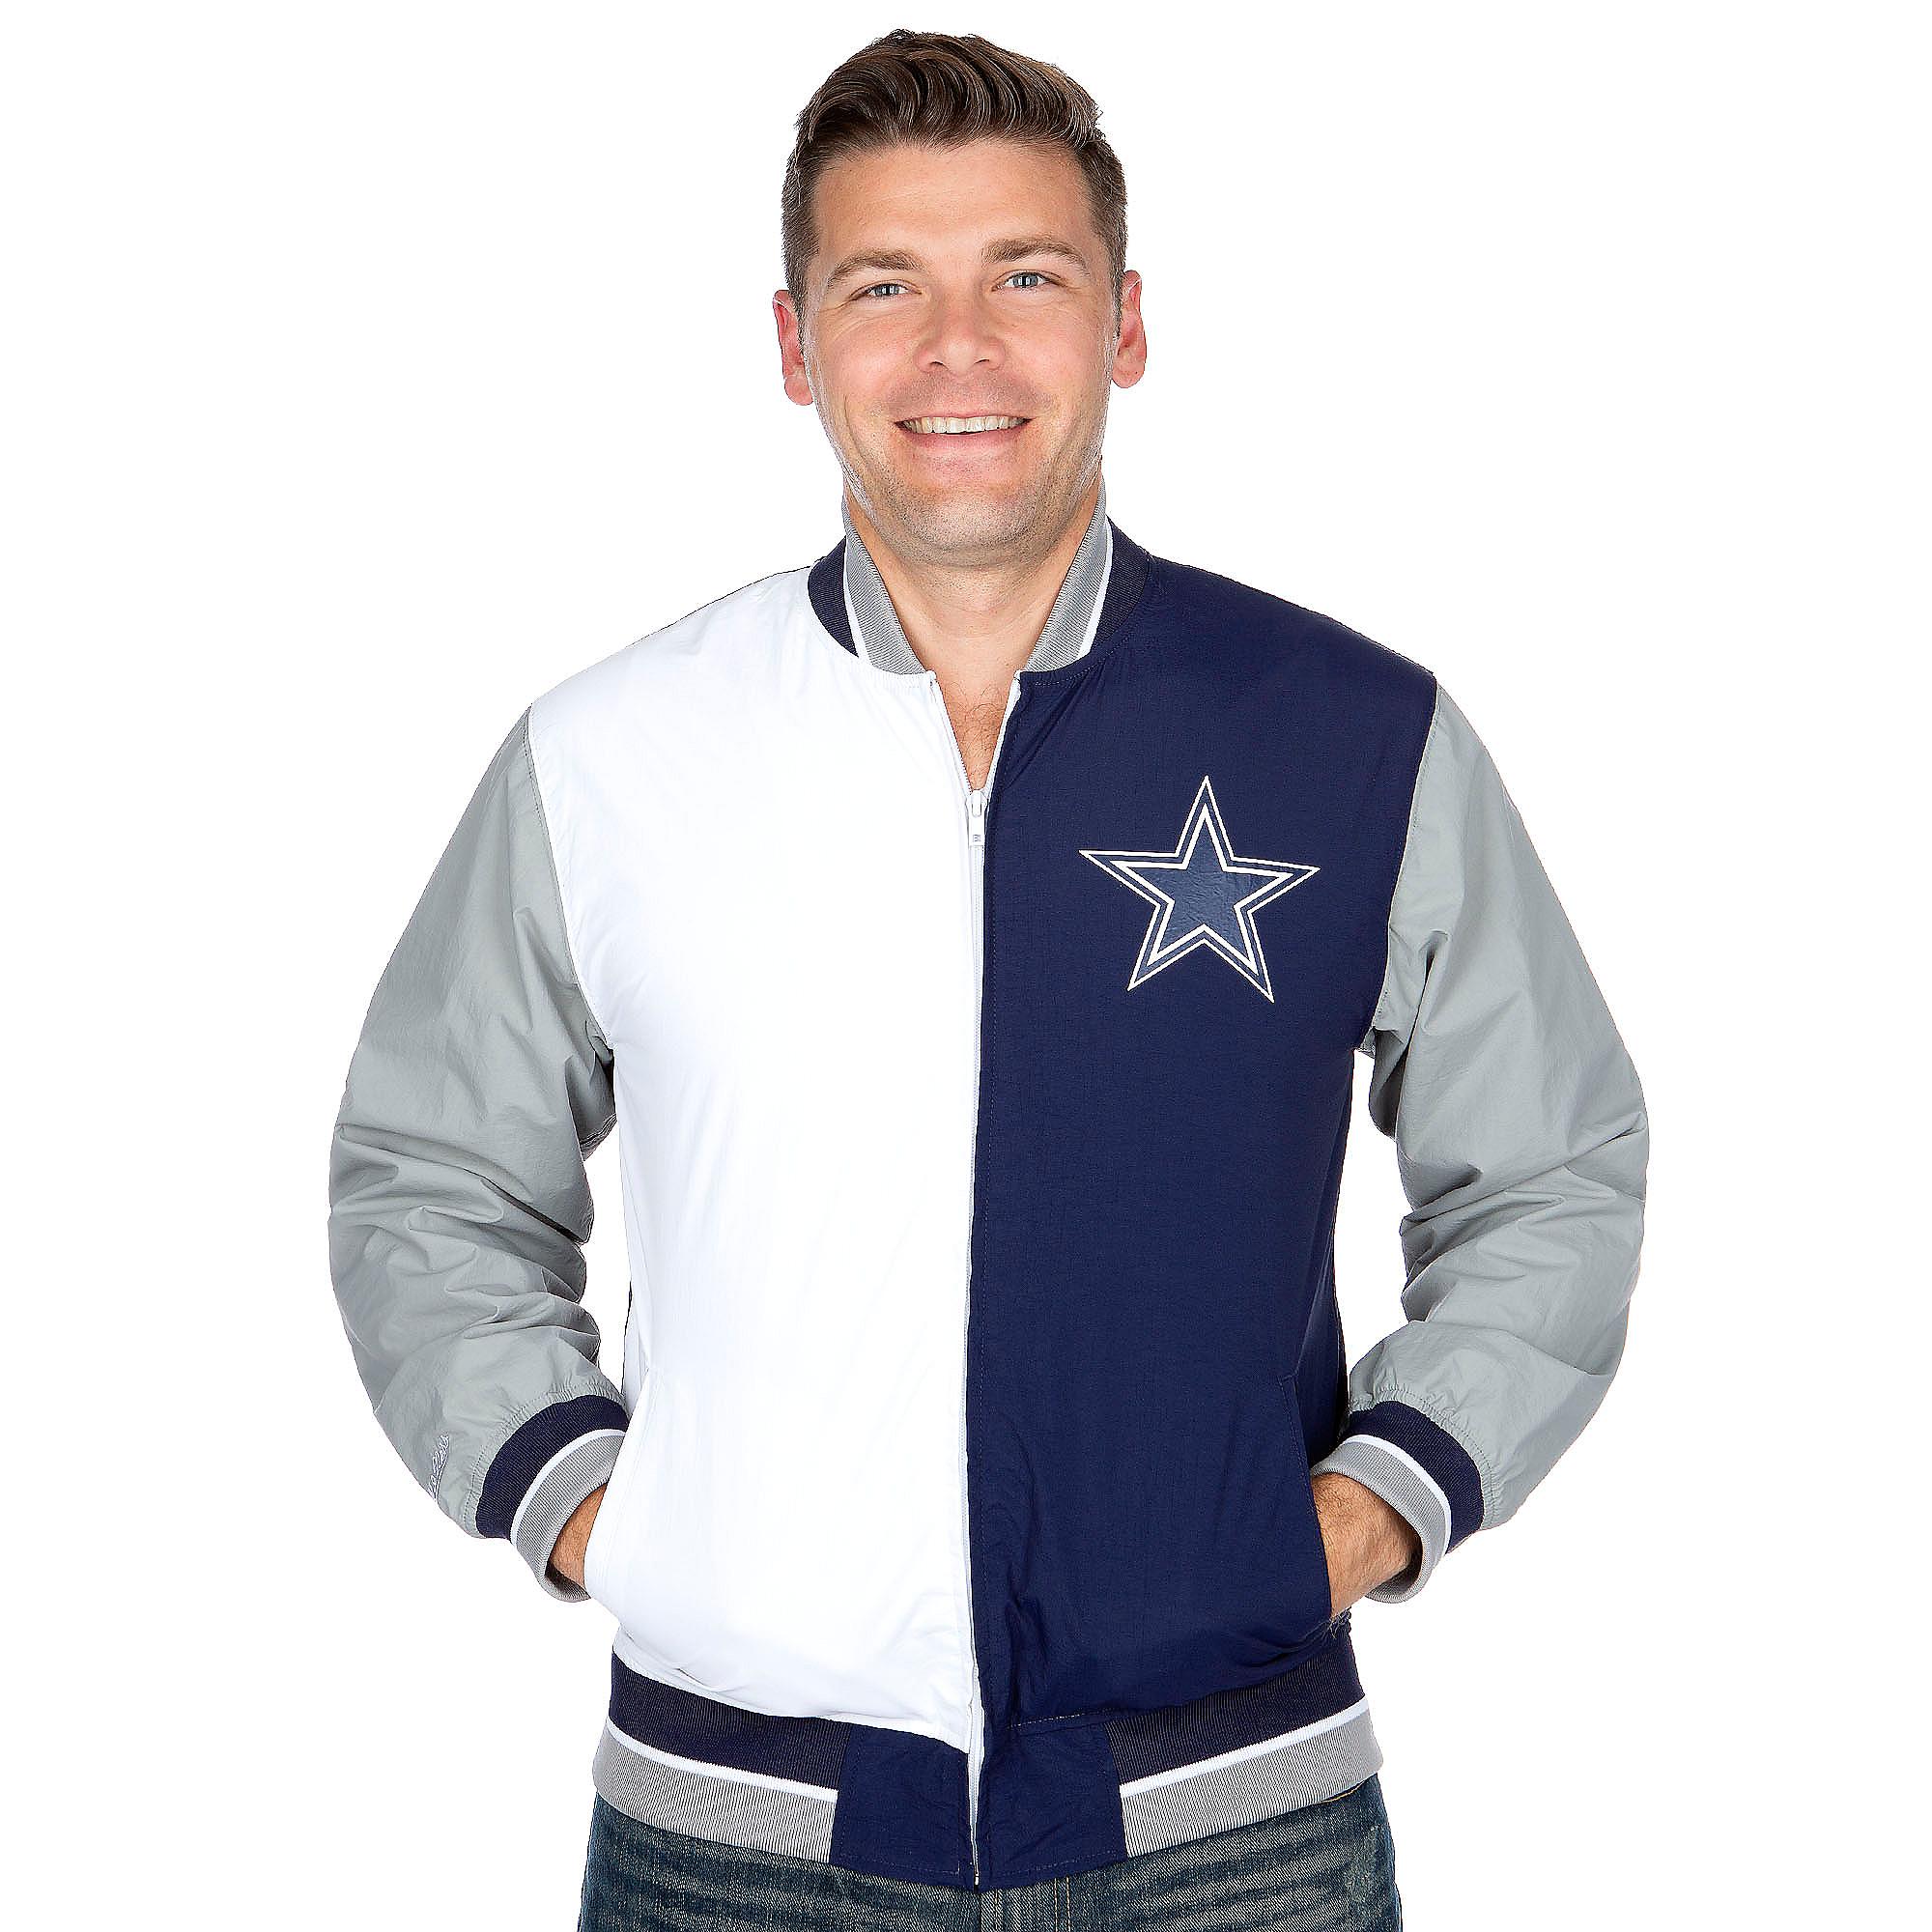 brand new 3550f 72789 Dallas Cowboys Mitchell & Ness Team History Warm Up Jacket   Dallas Cowboys  Pro Shop